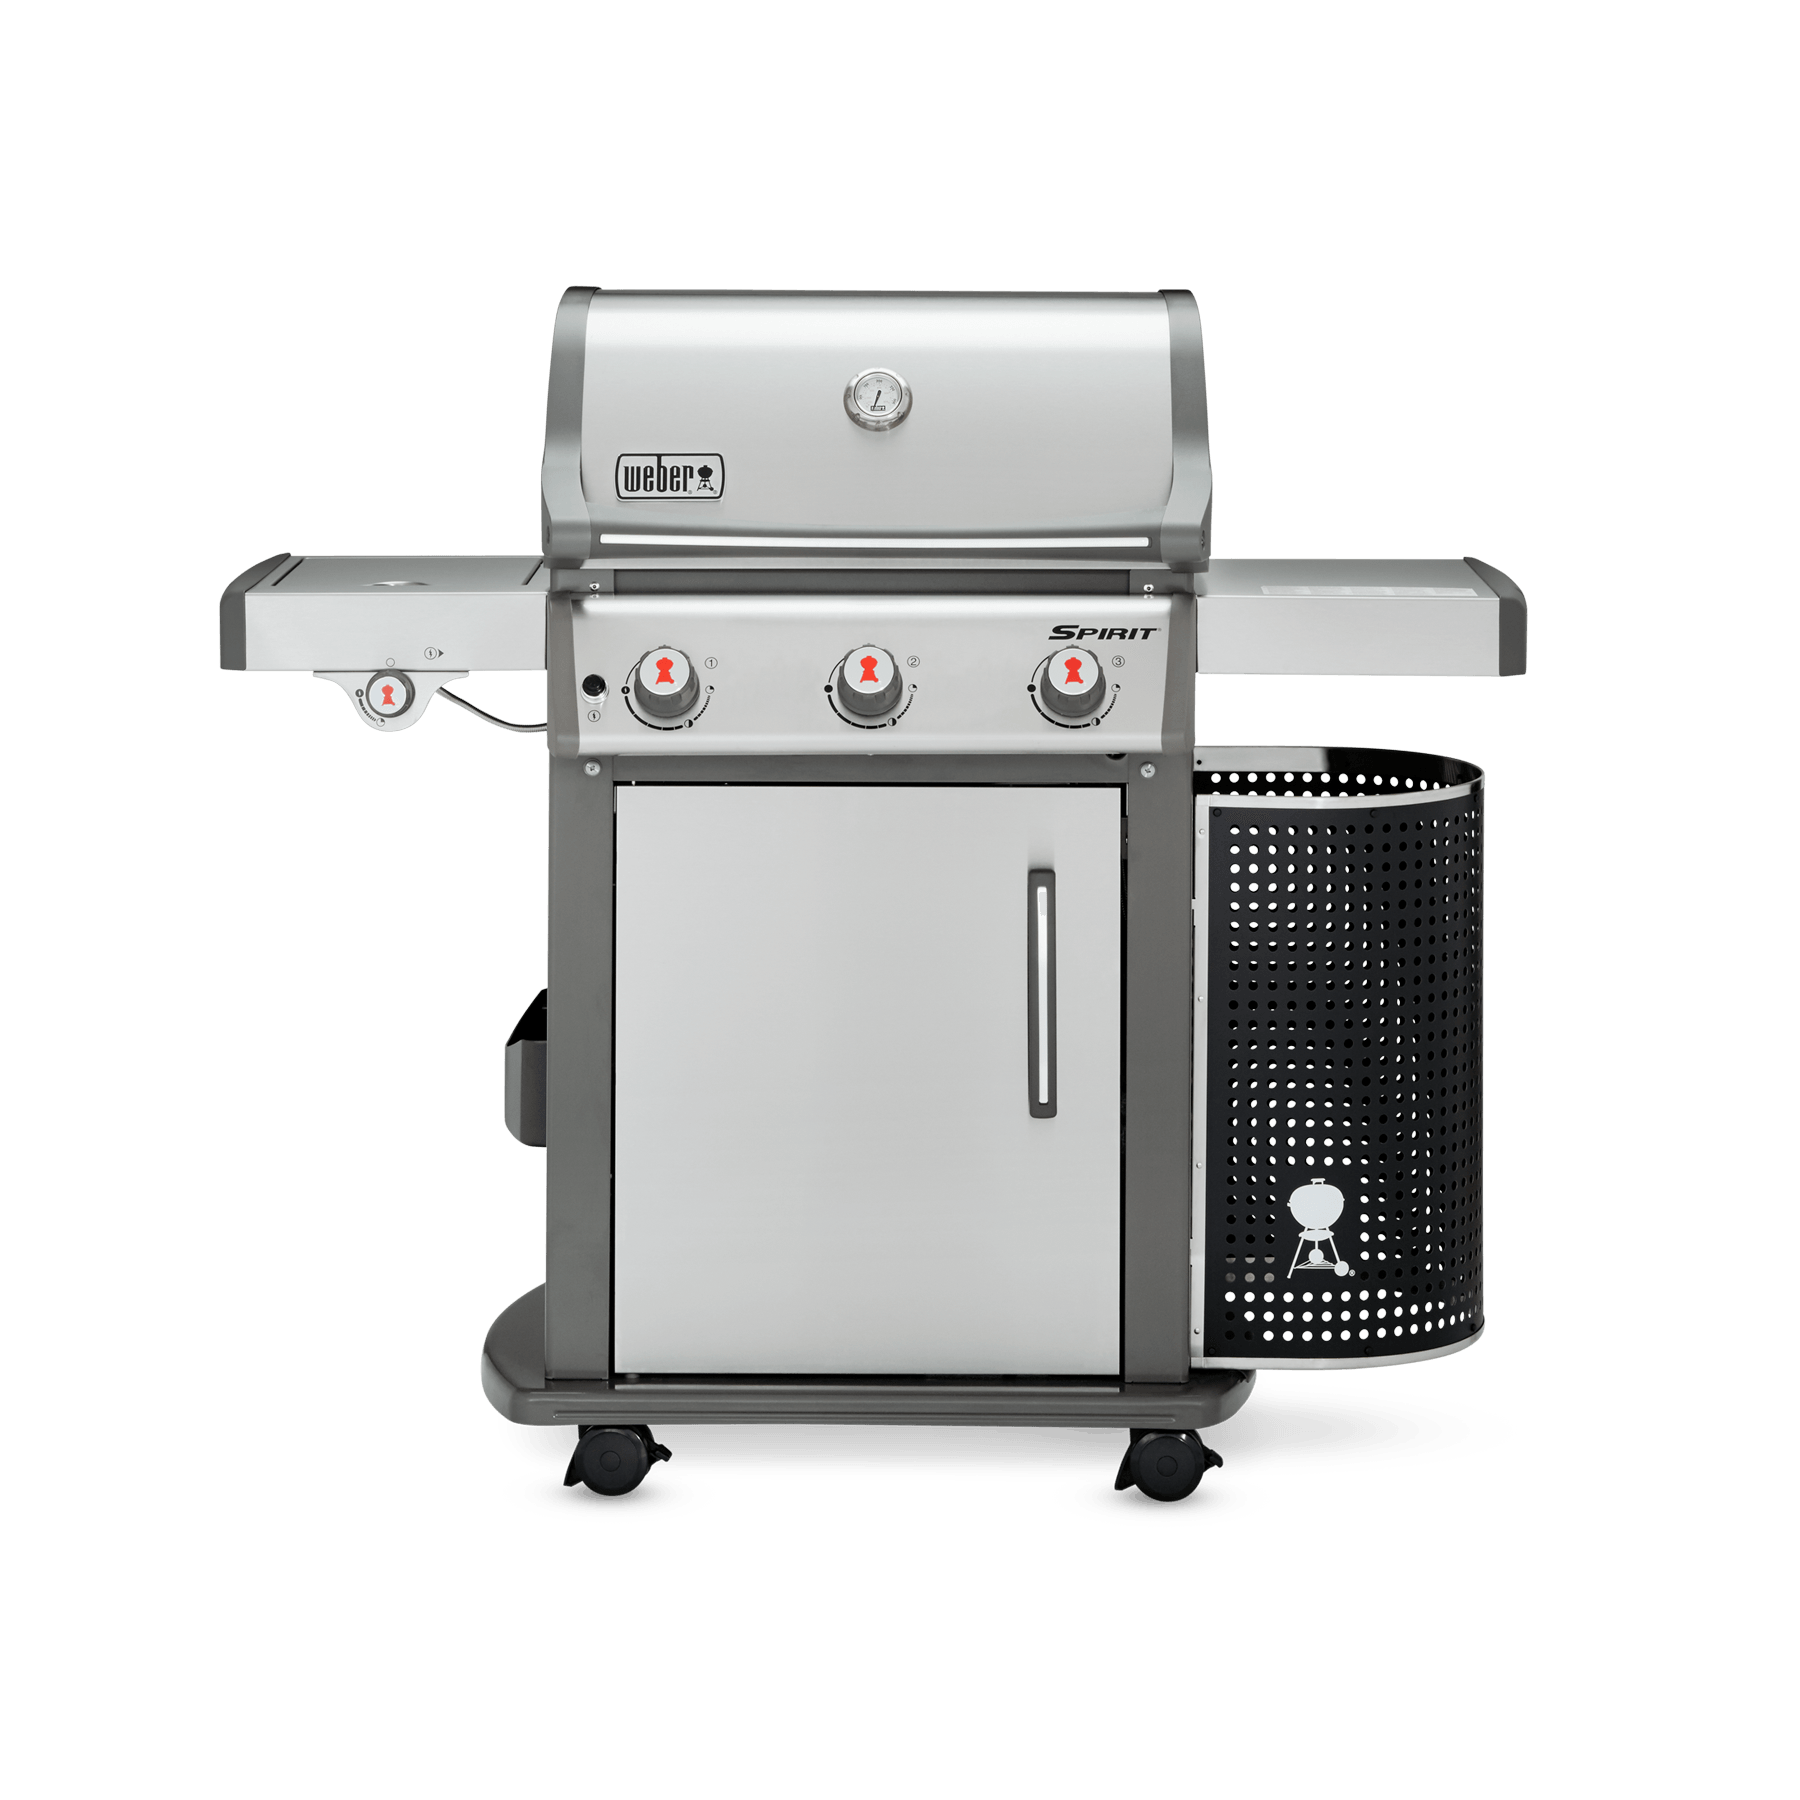 Spirit Premium S-320 GBS Gasbarbecue